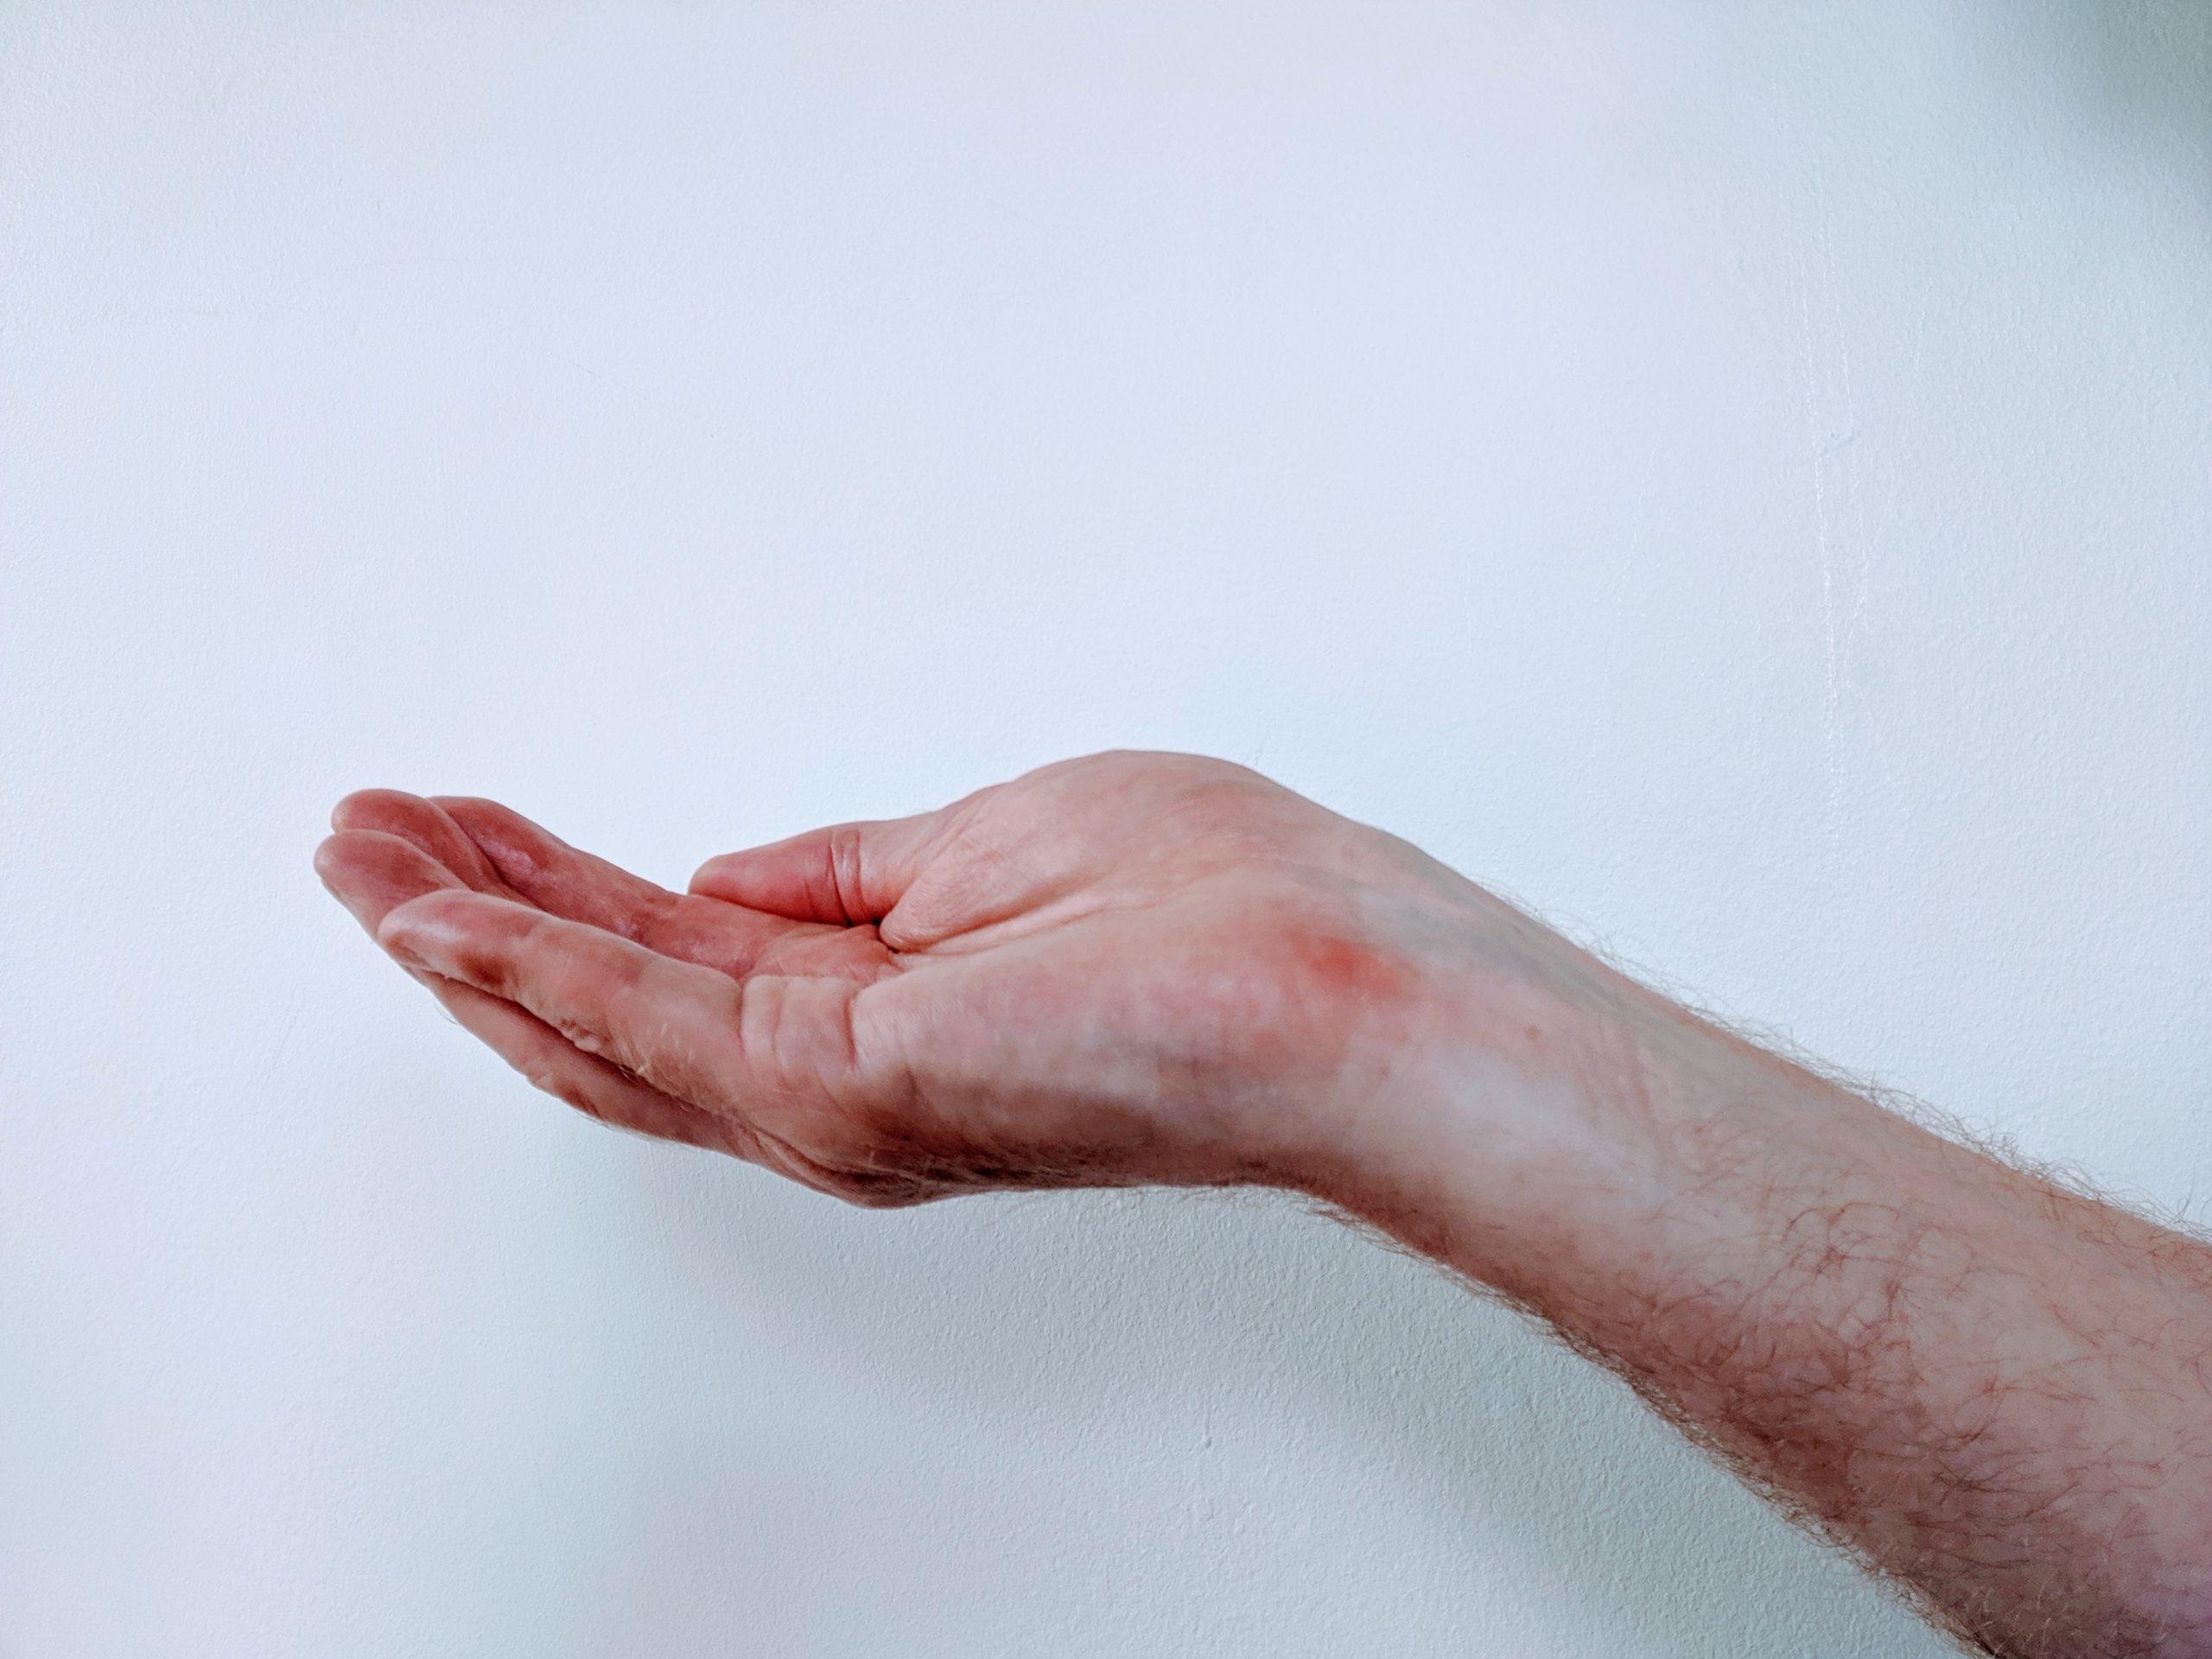 The reiki hand position